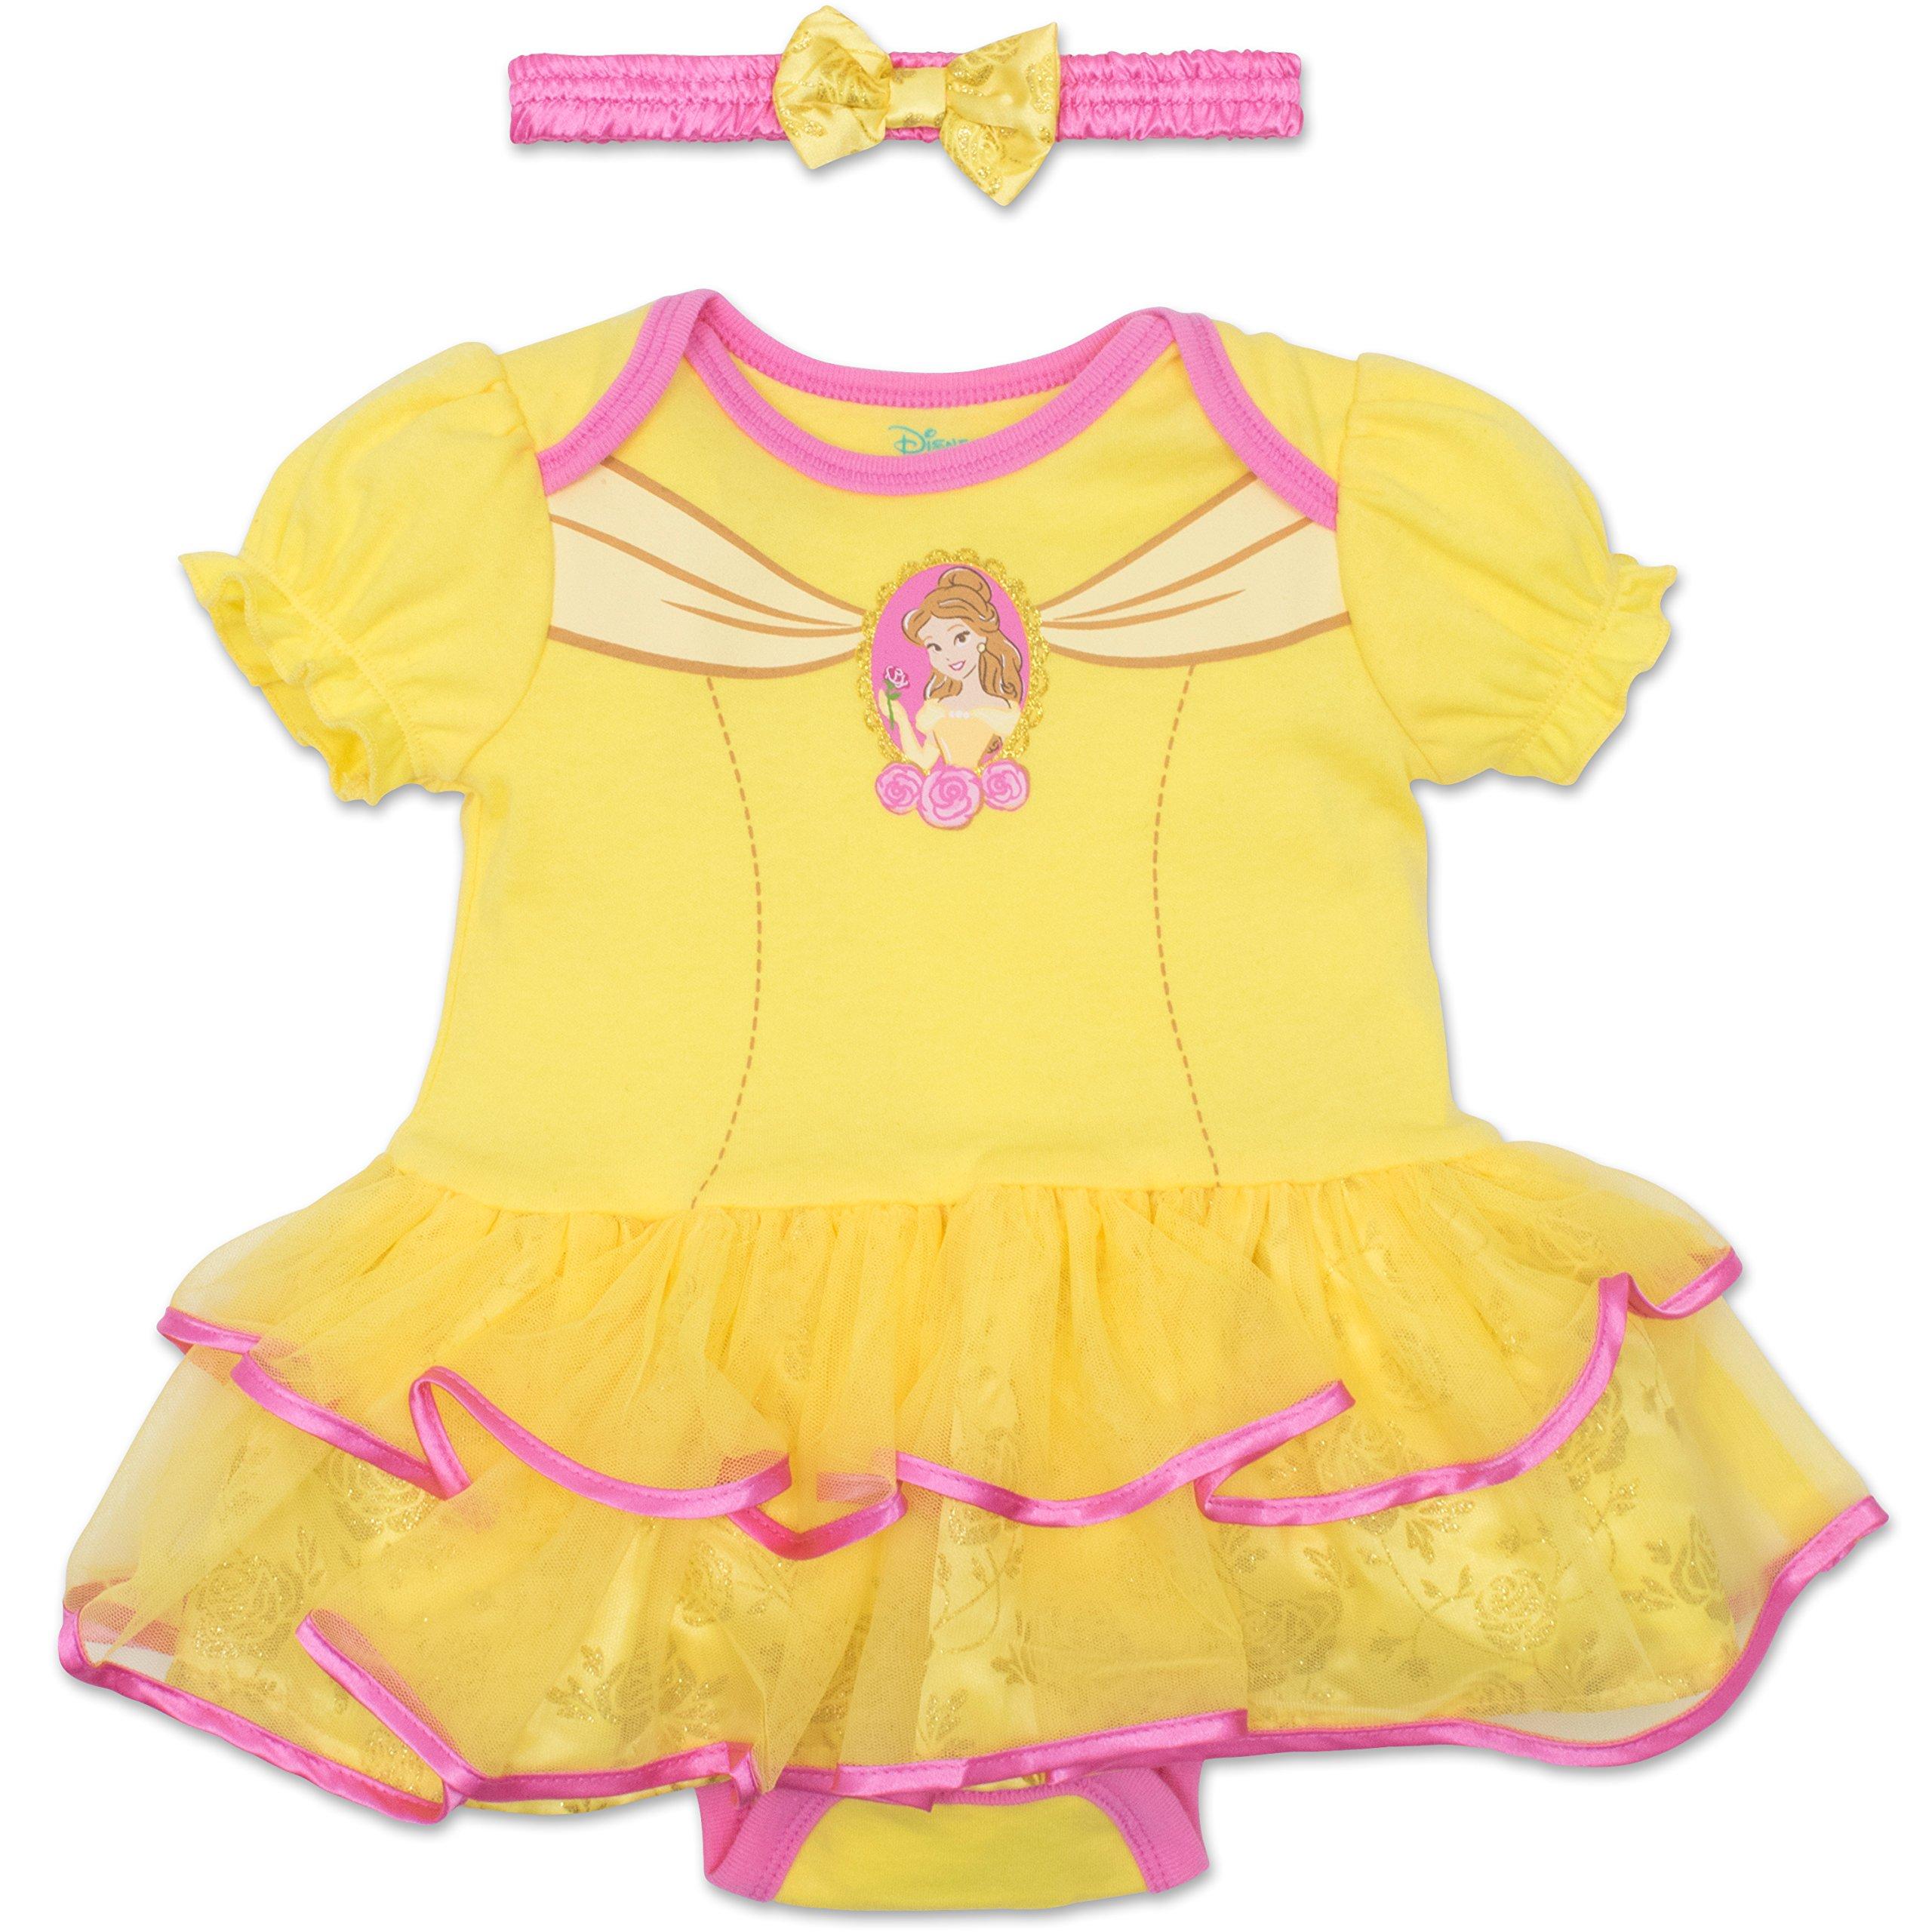 Disney Princess Belle Baby Girls' Costume Tutu Dress Bodysuit and Headband - Yellow, 12 Months